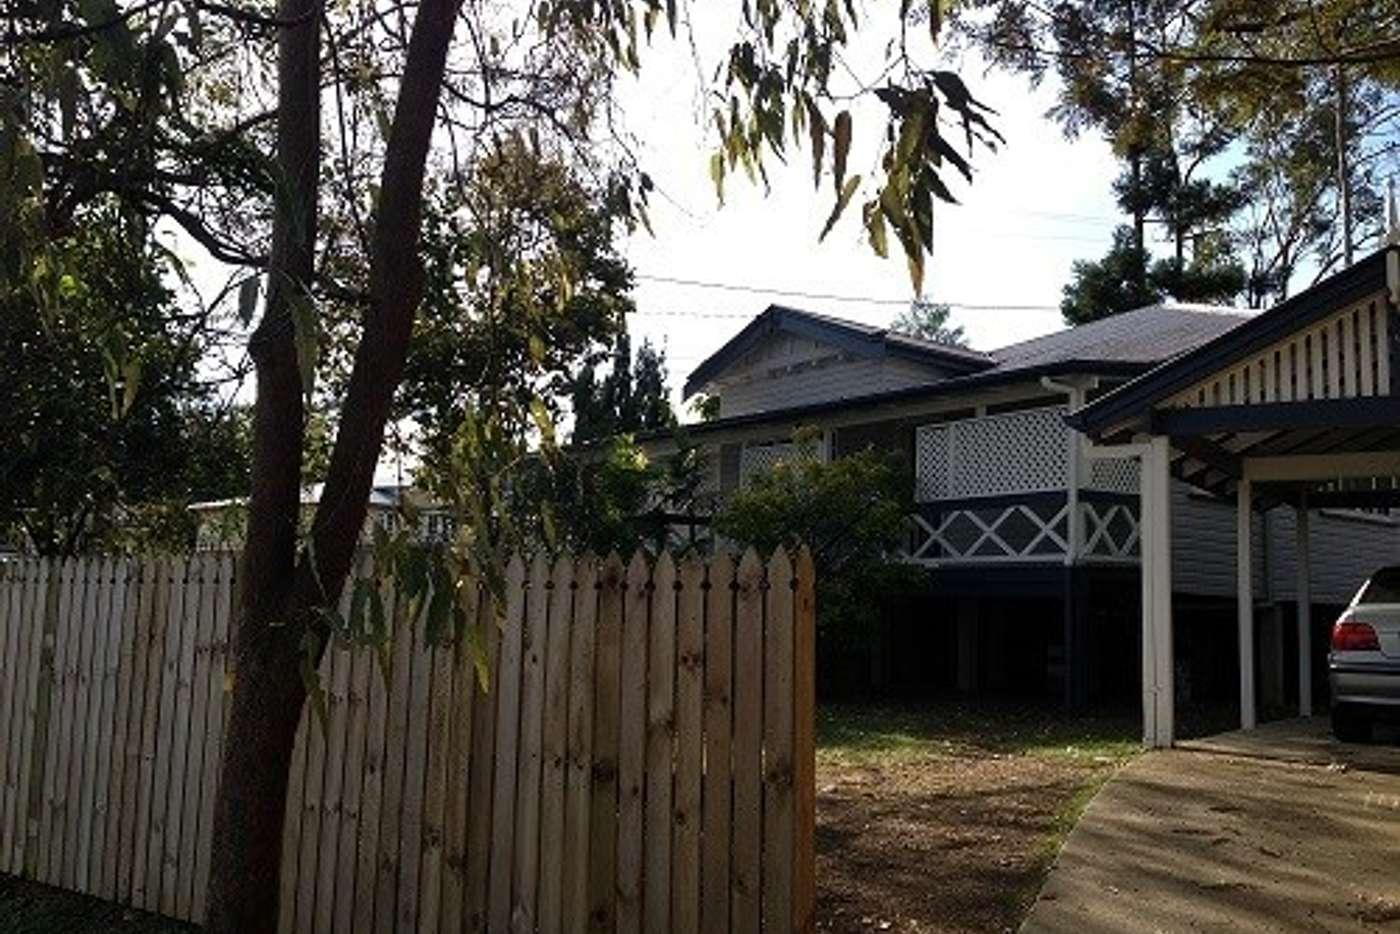 Main view of Homely house listing, 37 Hillsdon Road, Taringa QLD 4068